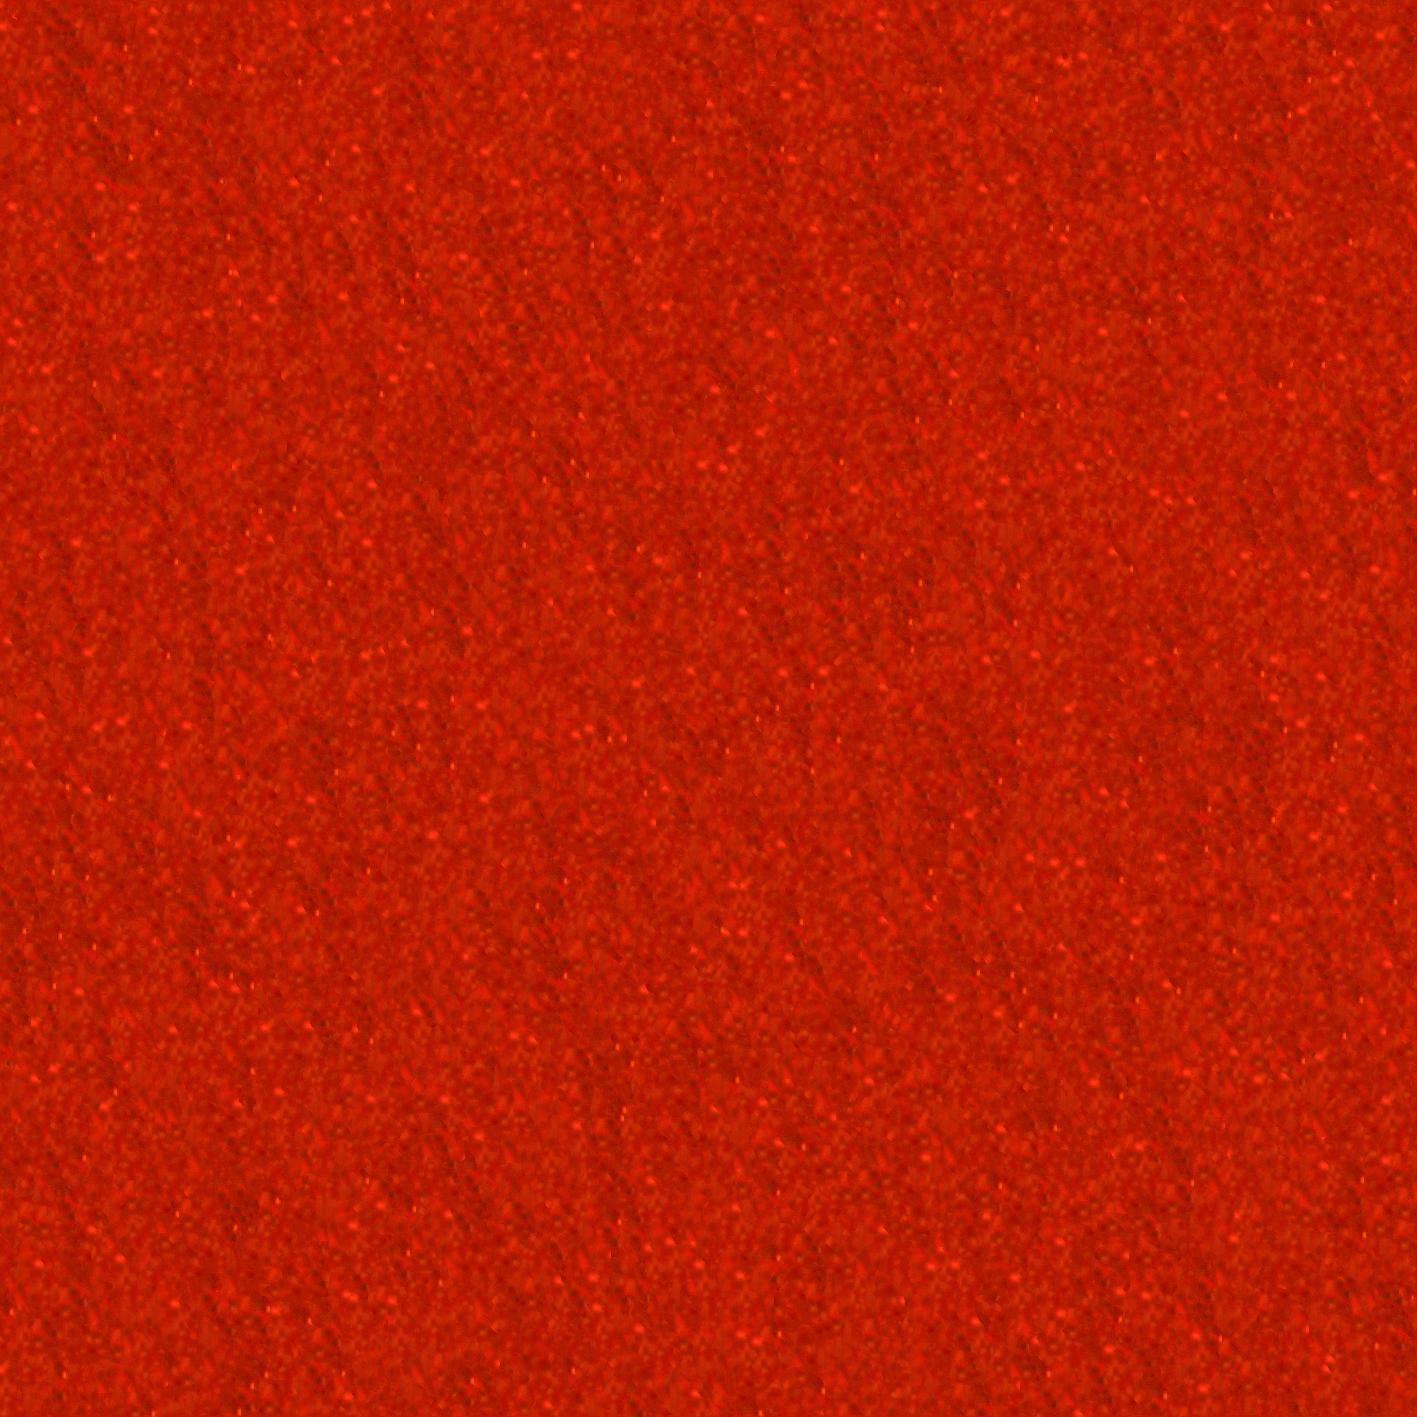 Red glitter by tarfish...